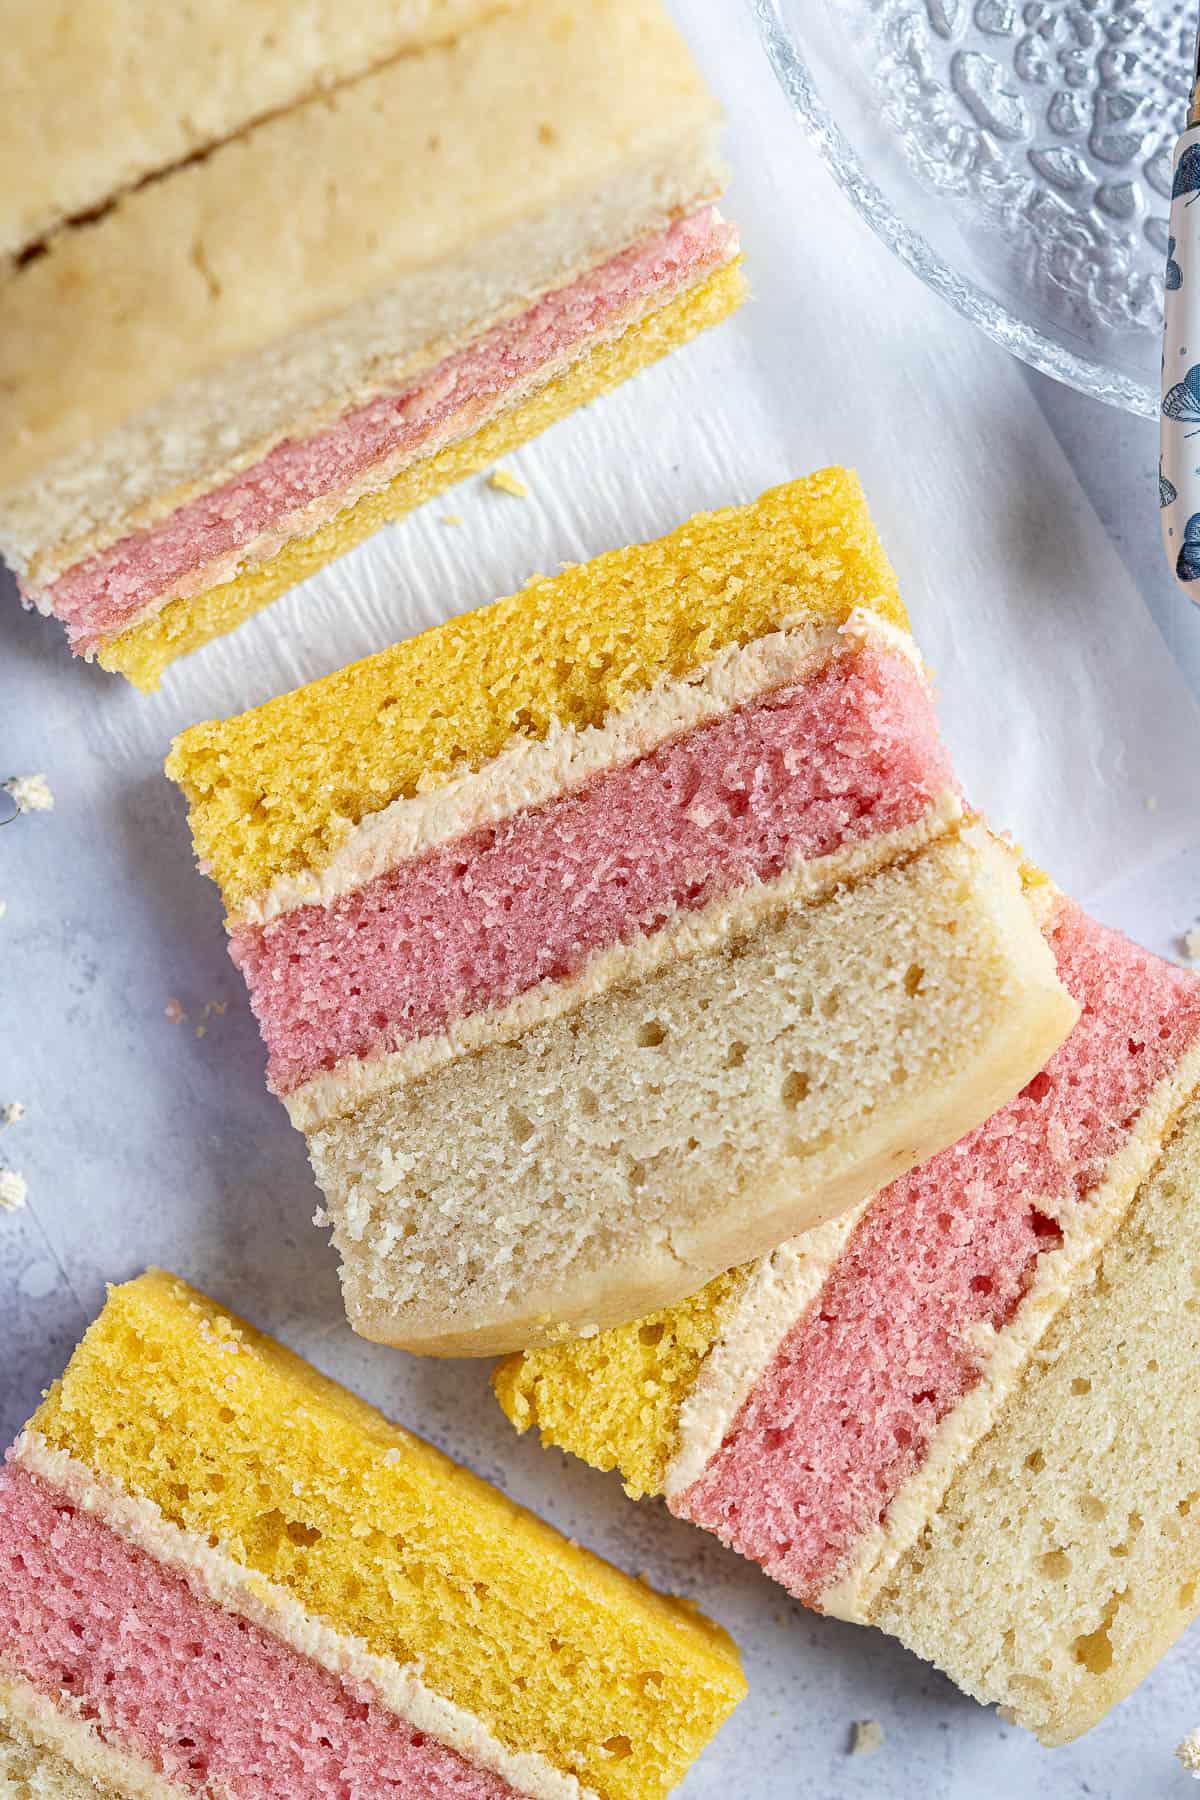 Close up of slices of vegan angel cake.